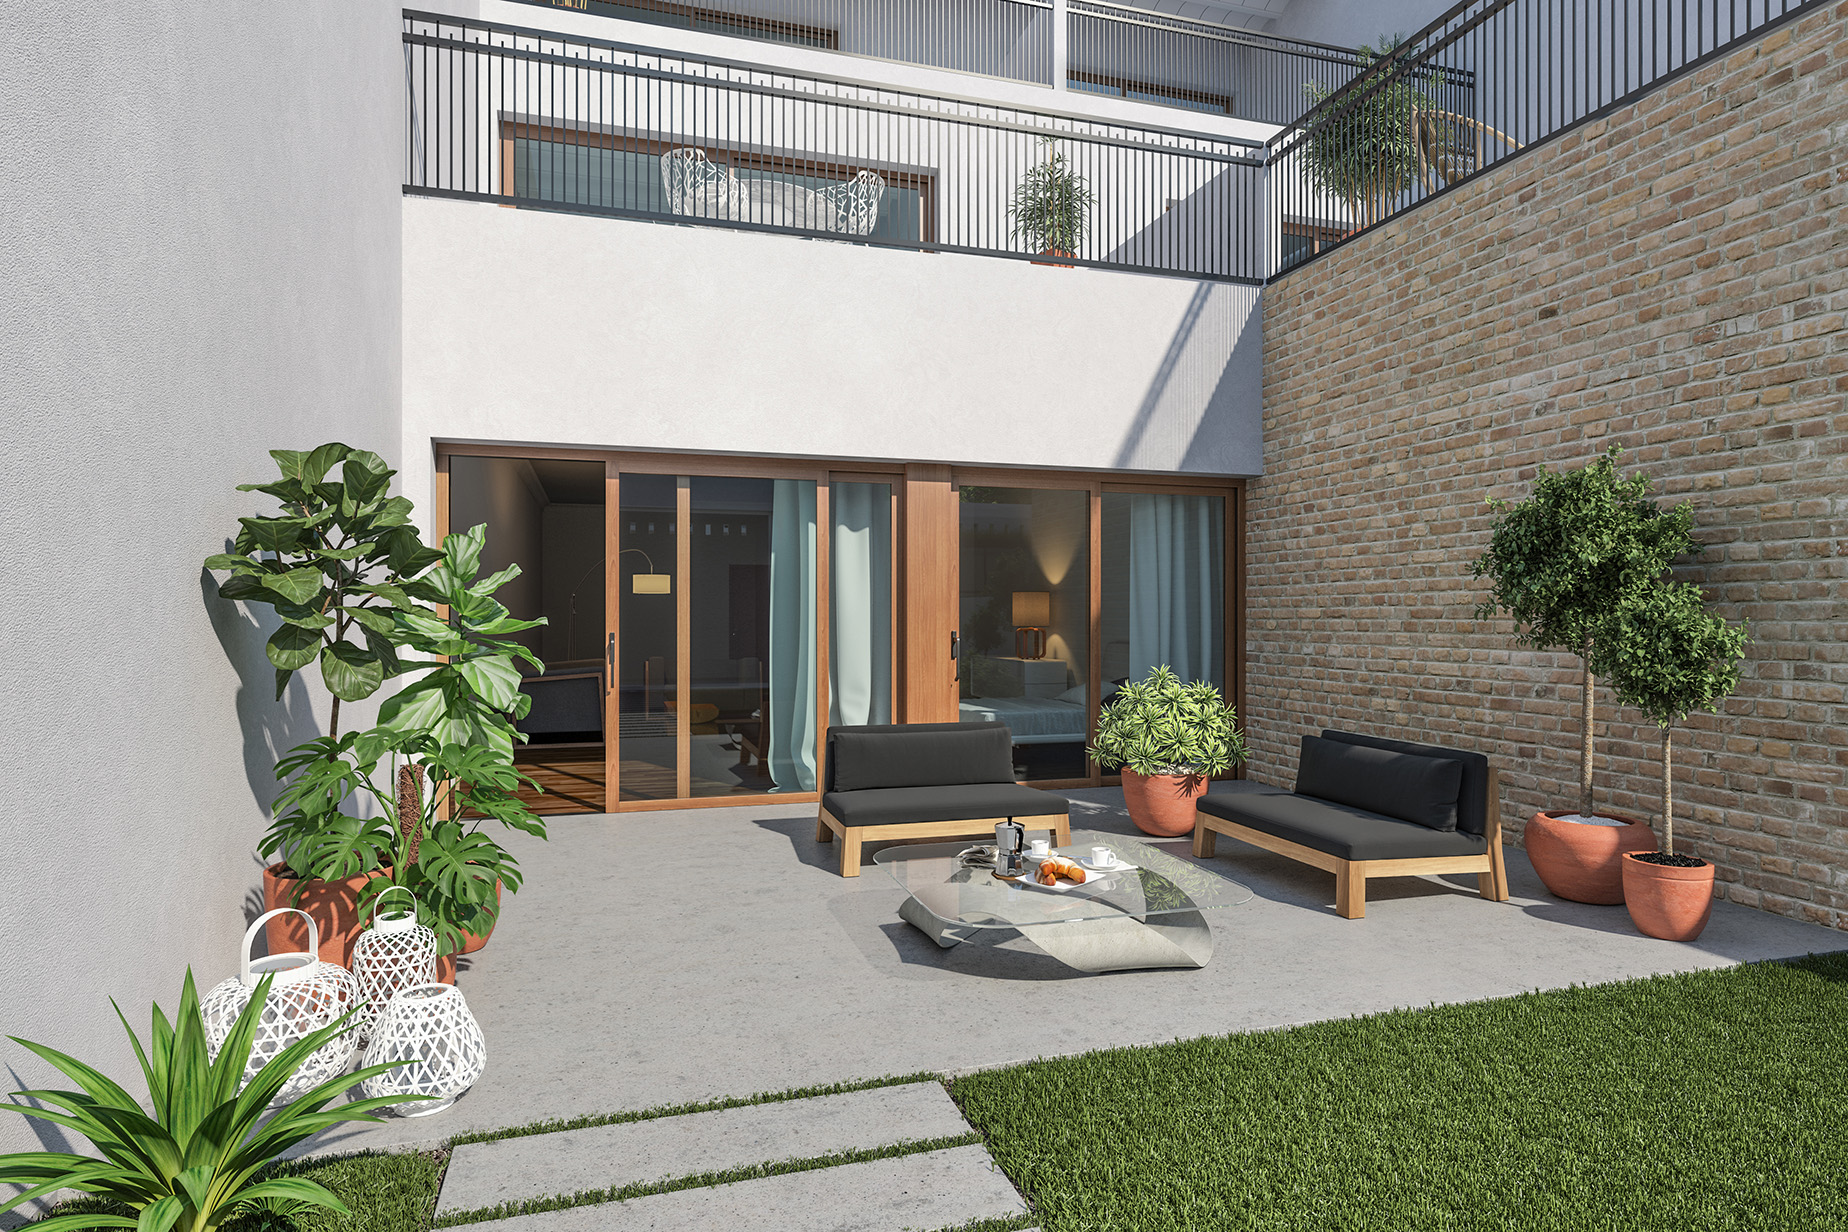 Apartamento para Venda às The Ground Floor Apartment in a New Building with a Garden Barcelona City, Barcelona, 08012 Espanha